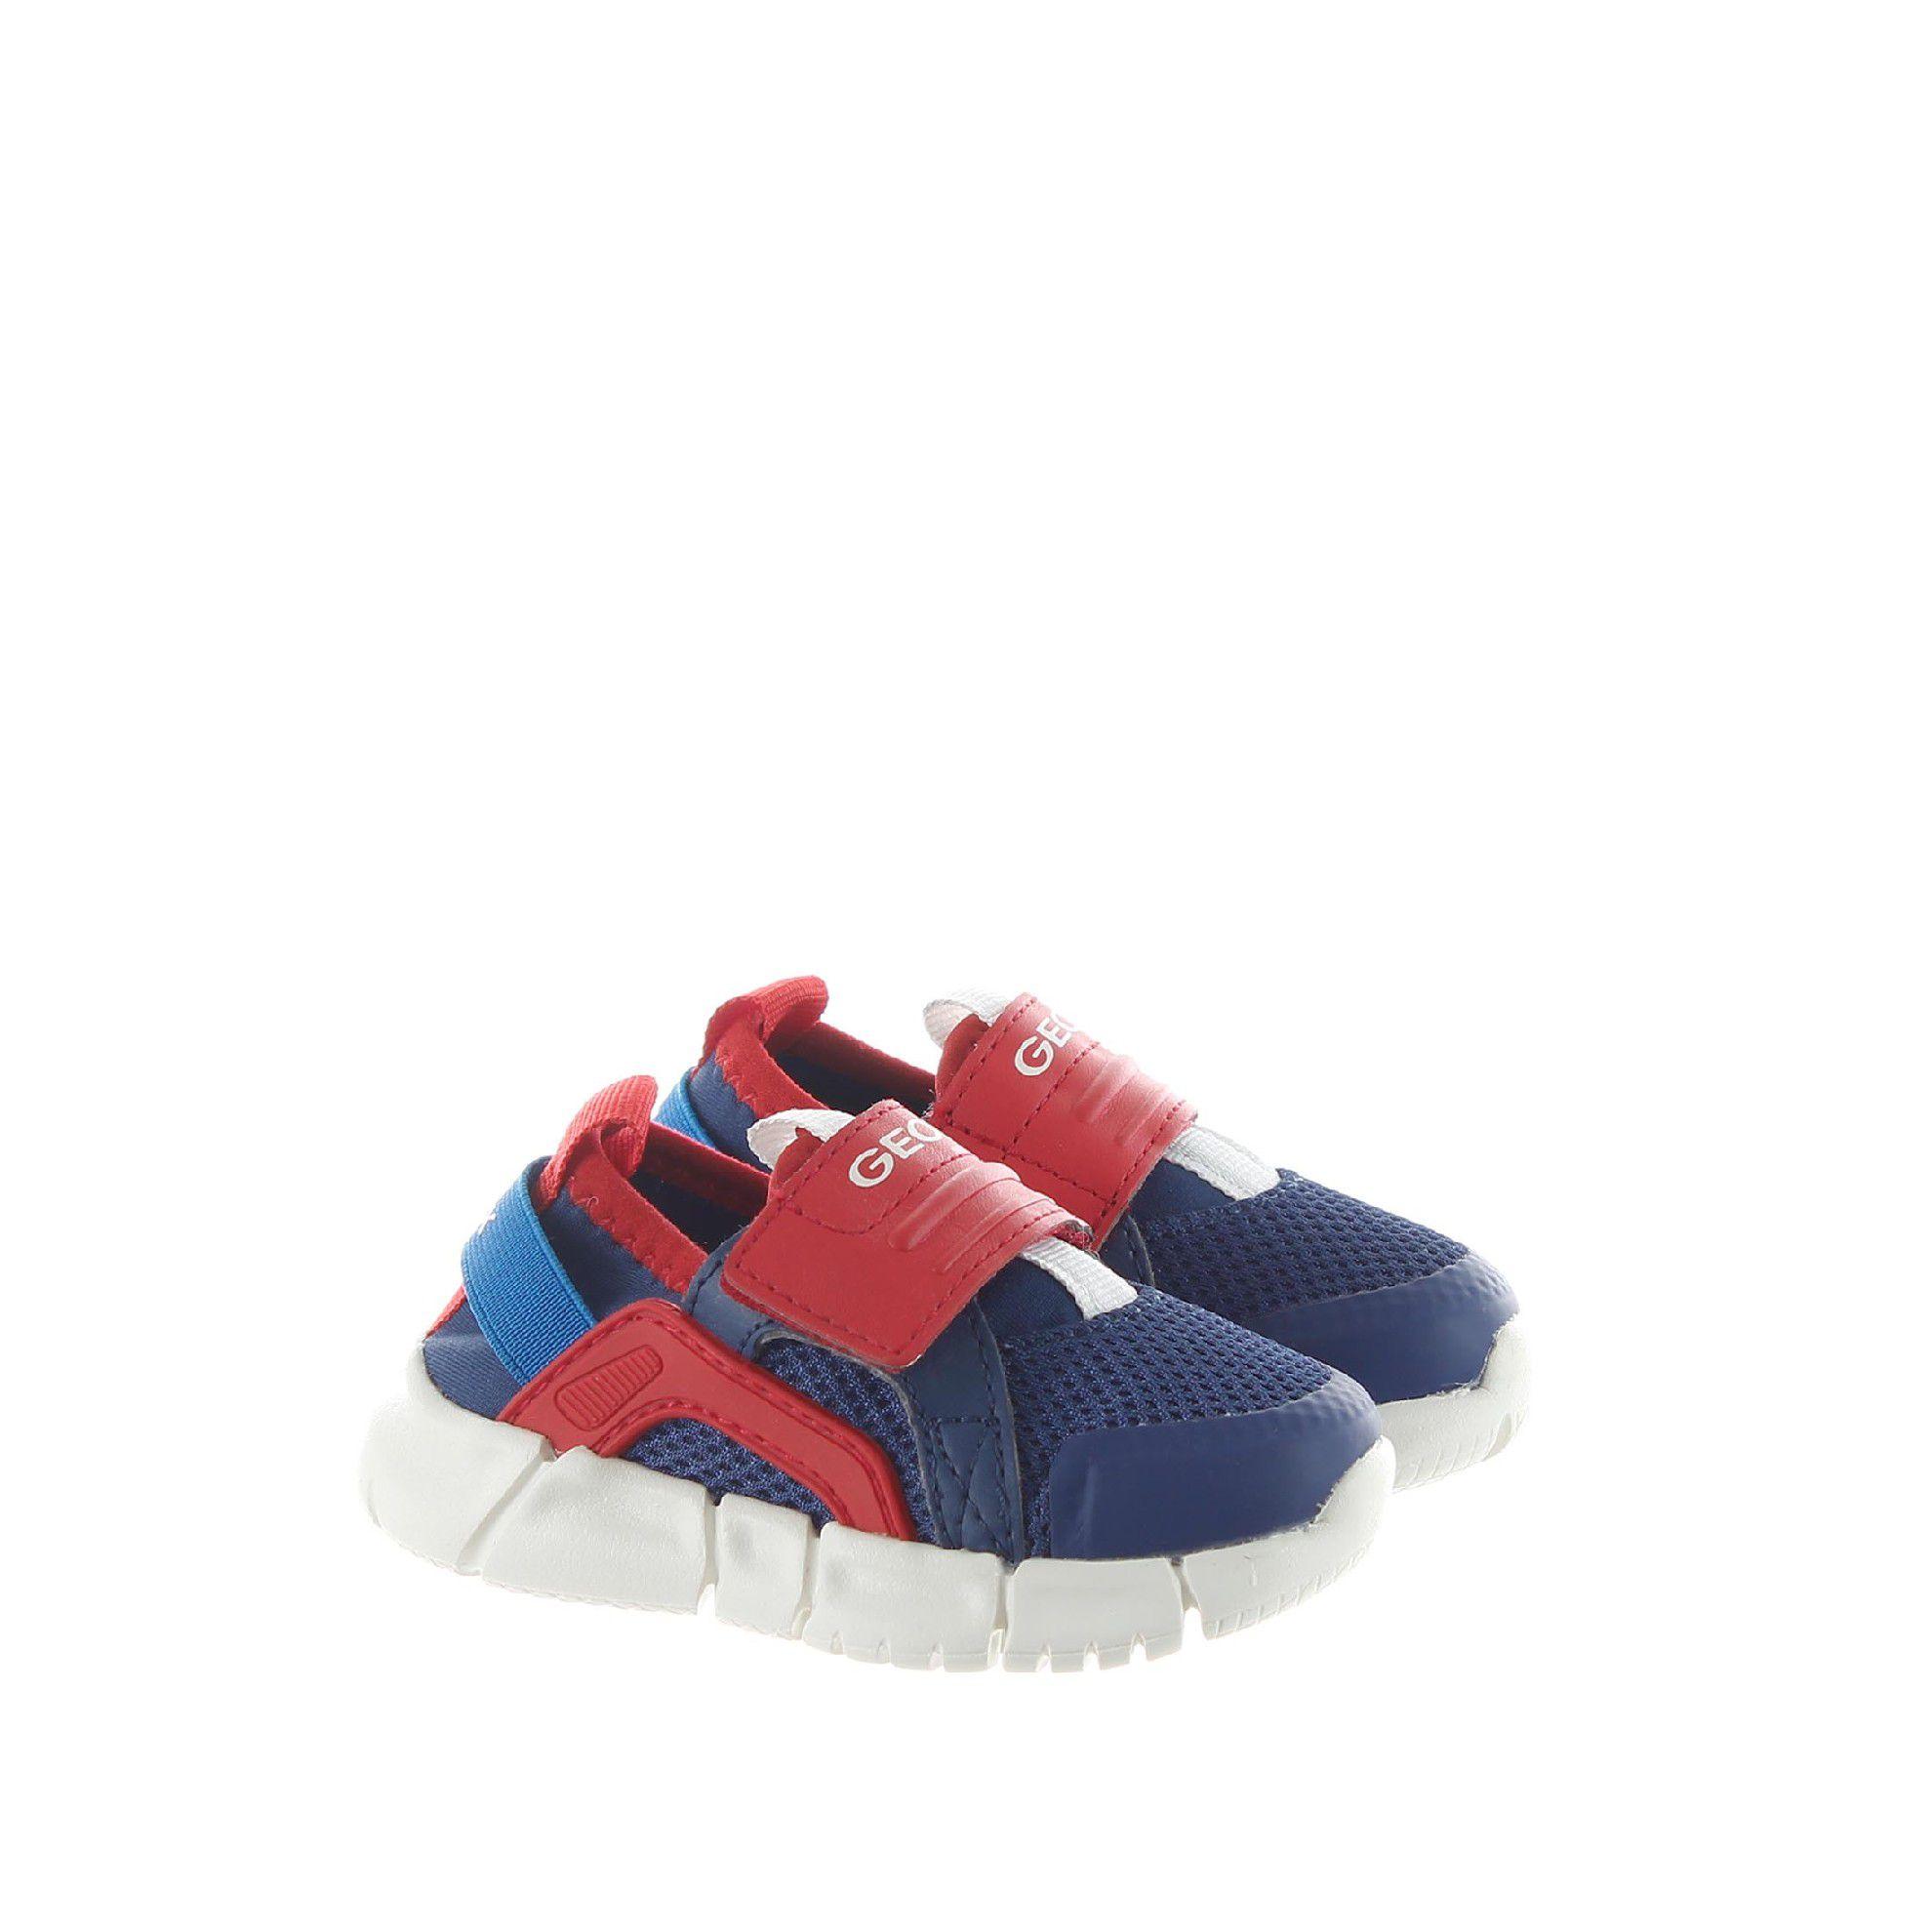 Geox sneaker flexyper in mesh e nappa da bambino